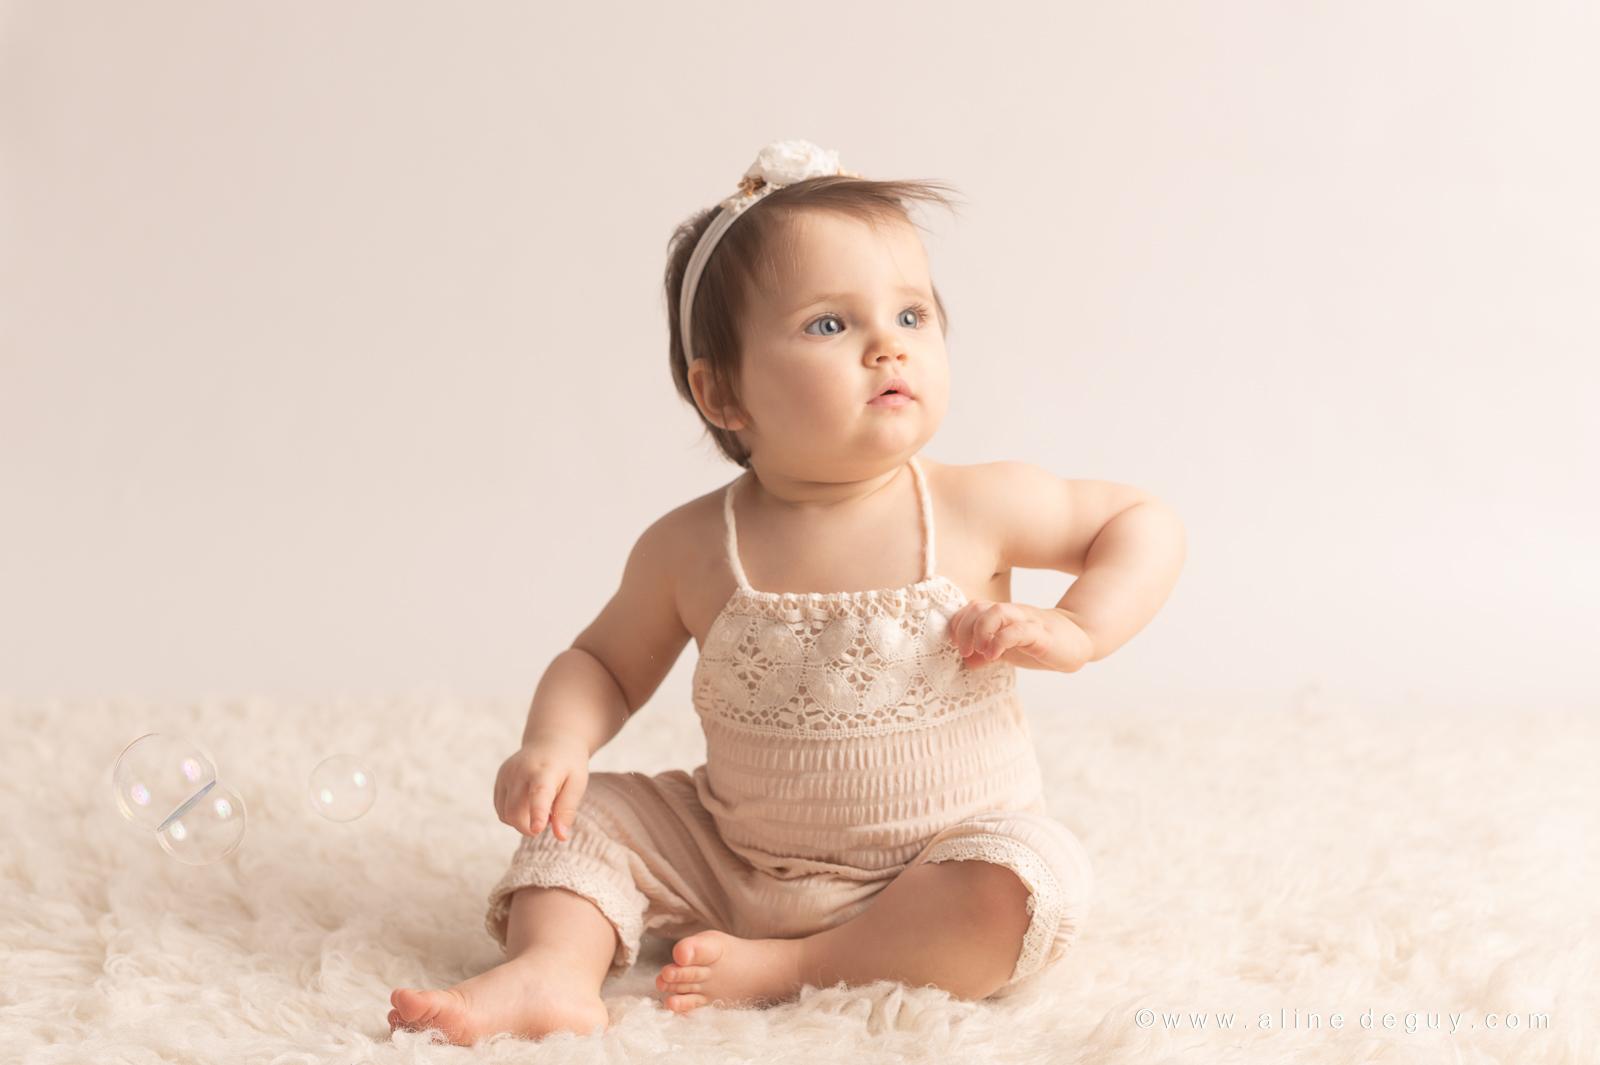 Photographe bébé neuilly sur seine, studio photo neuilly, studio photo boulogne